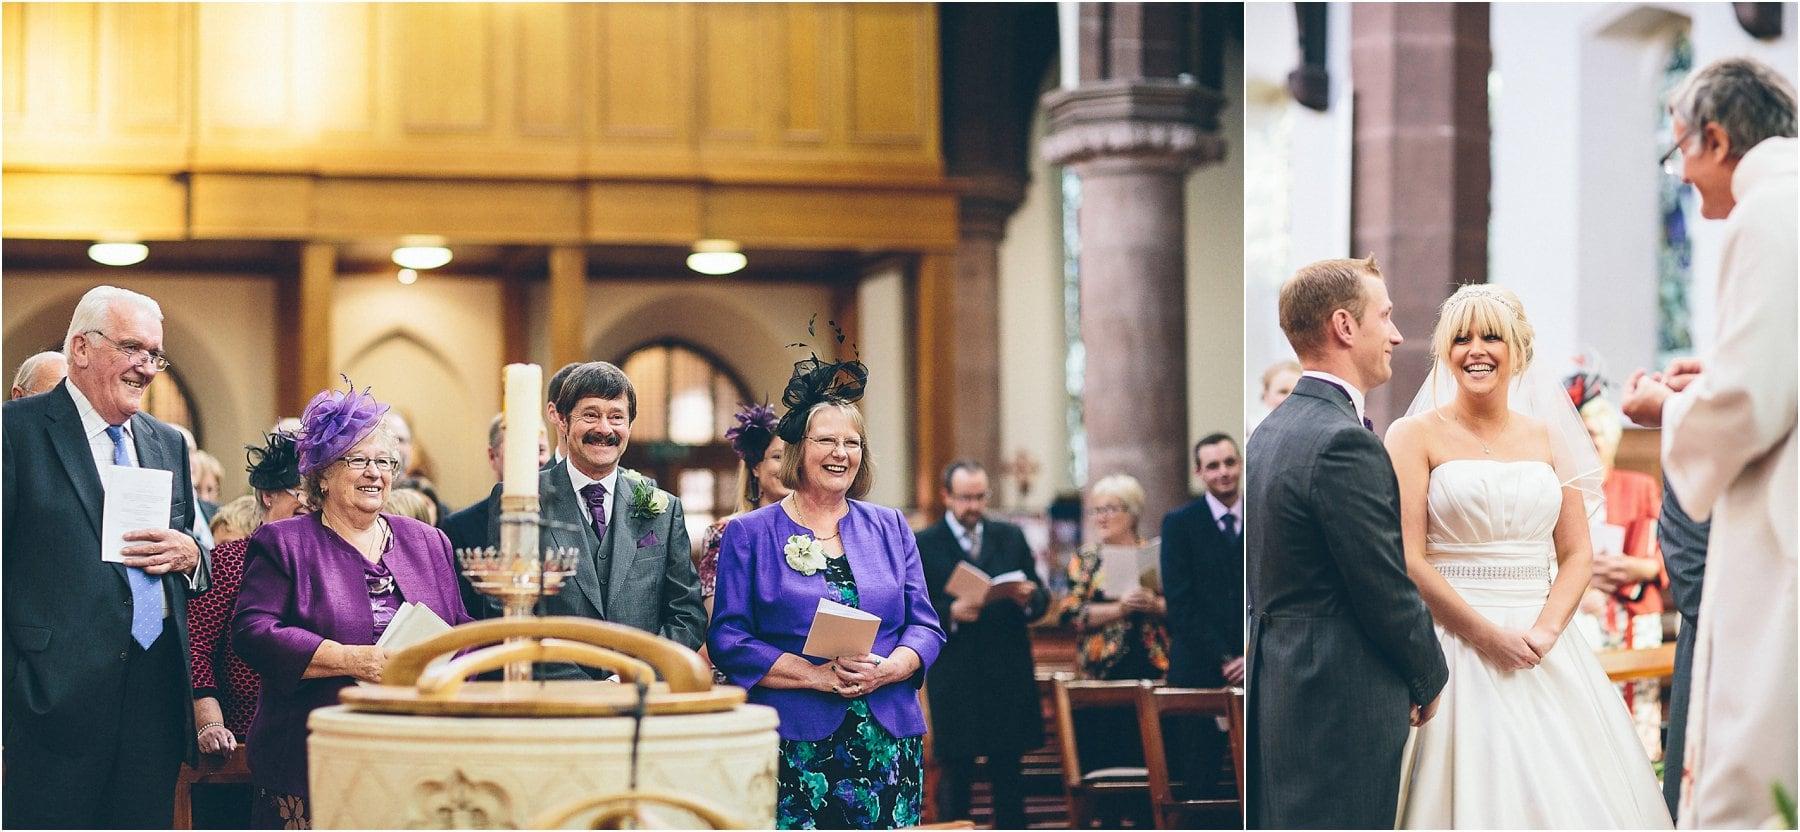 Crabwall_Manor_Wedding_Photography_0041